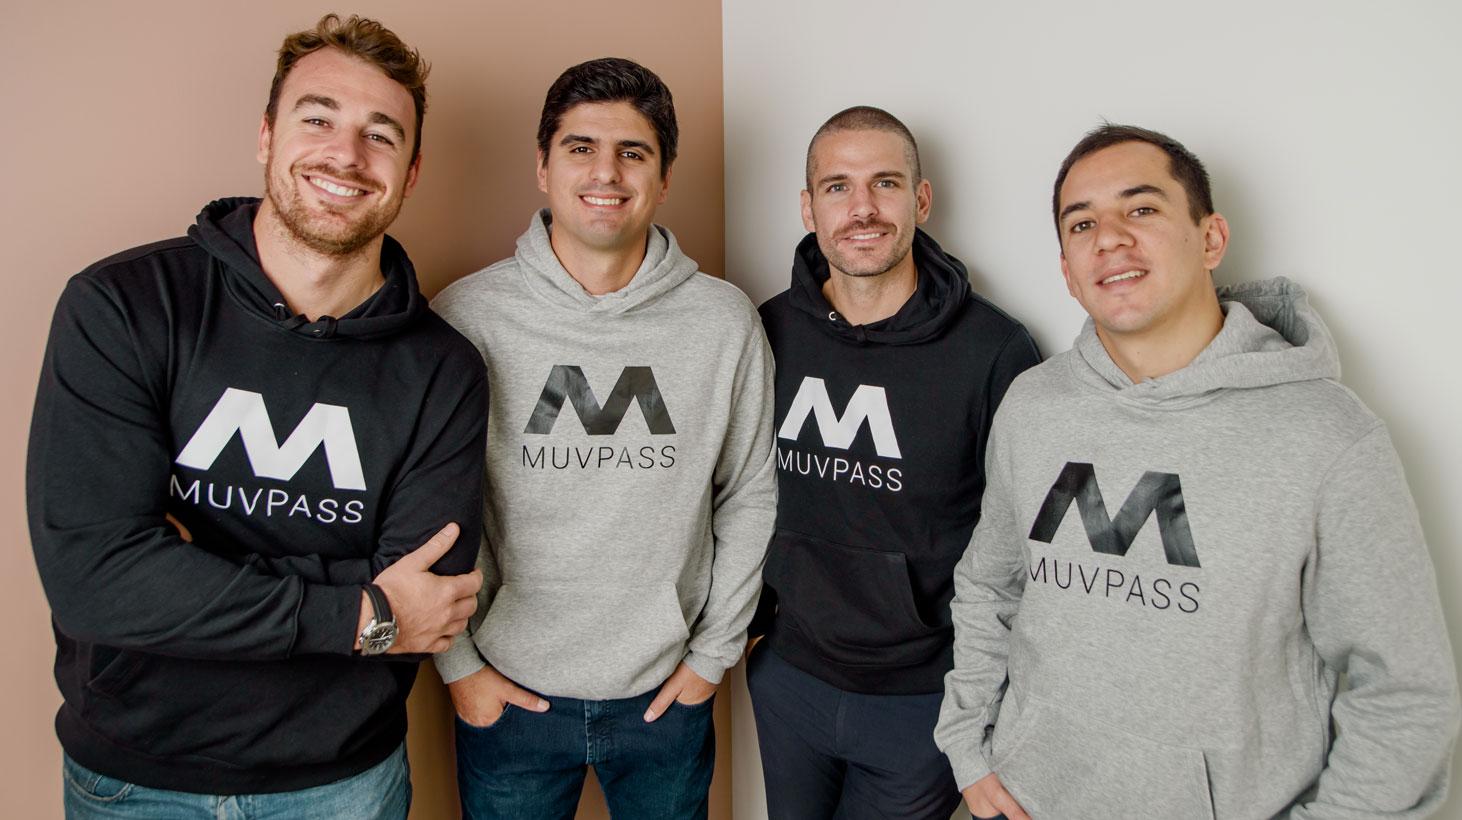 MuvPass es adquirida por ClassPass, líder de la industria fitness.